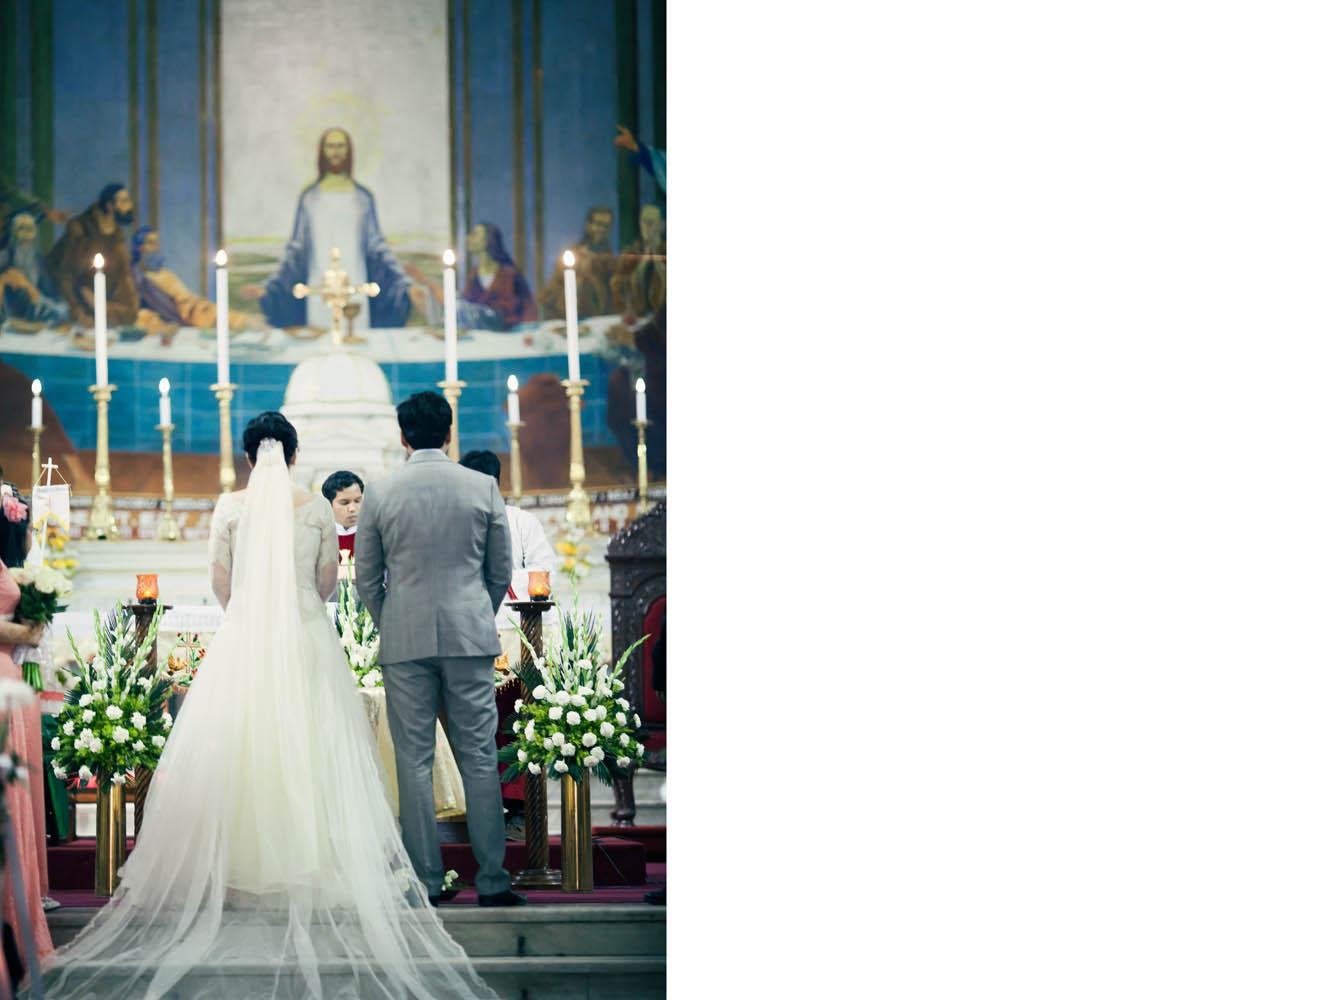 christian-wedding-7.jpg